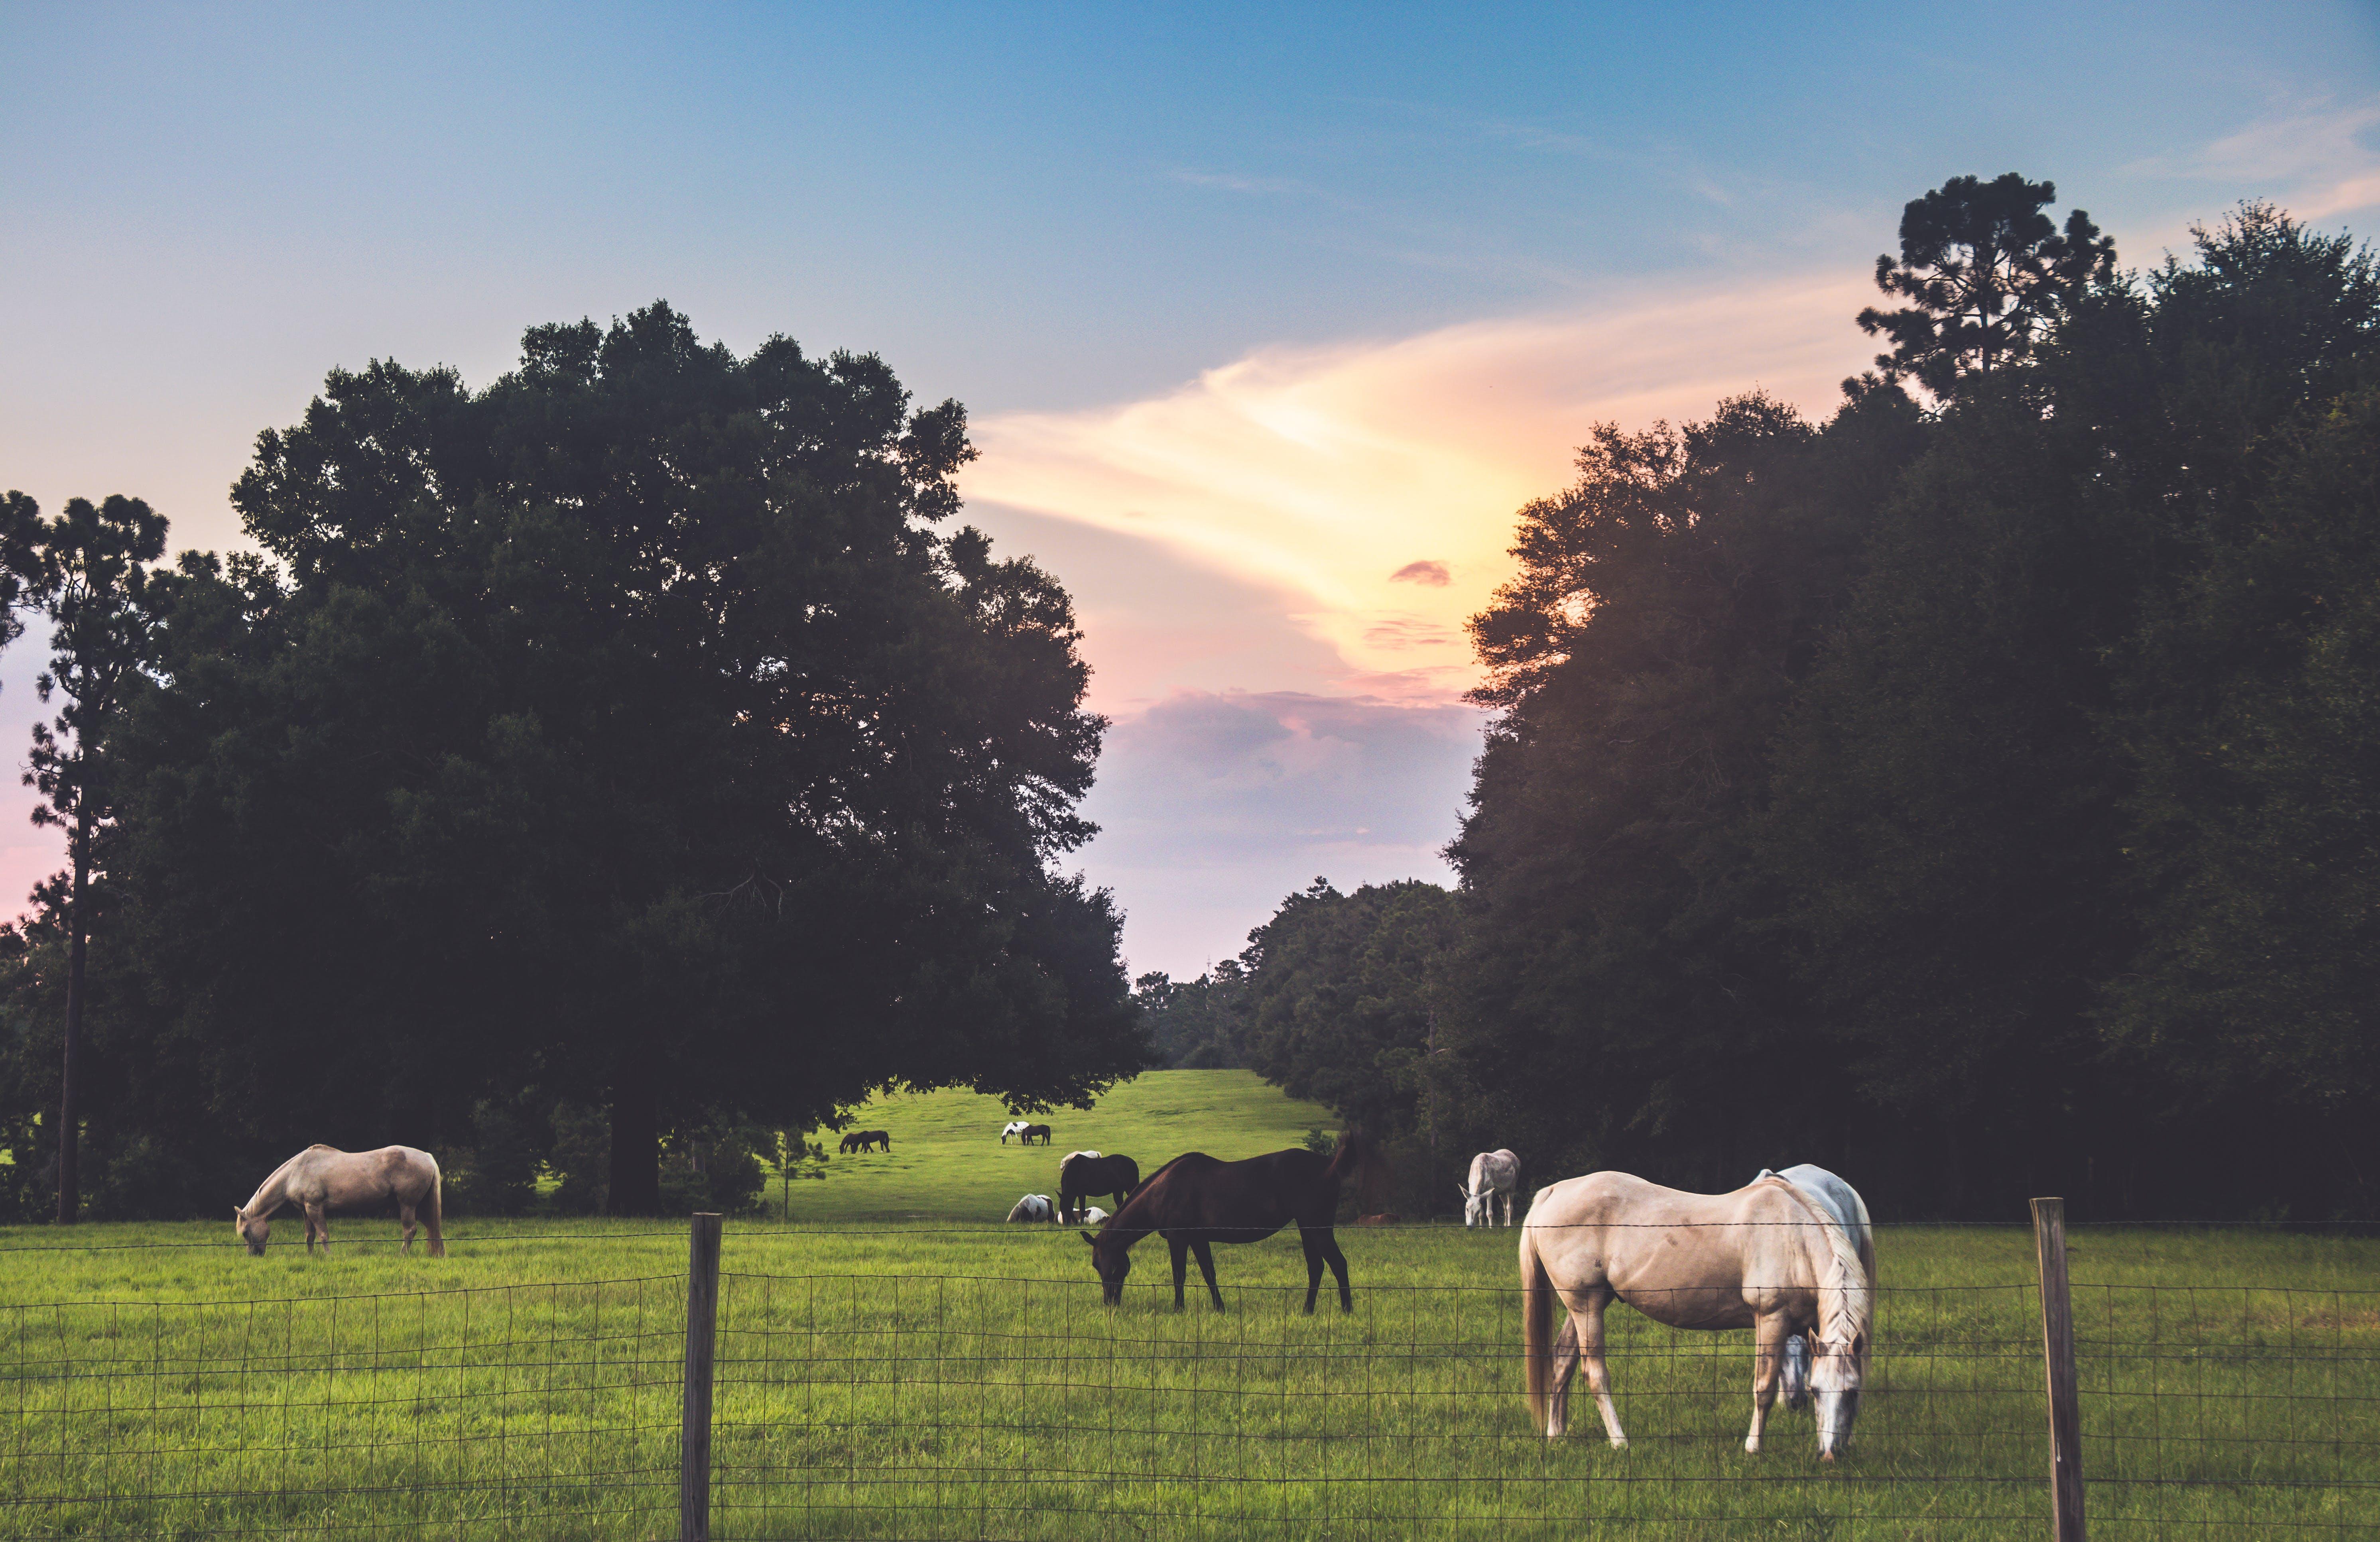 Free stock photo of field, countryside, farm, animals